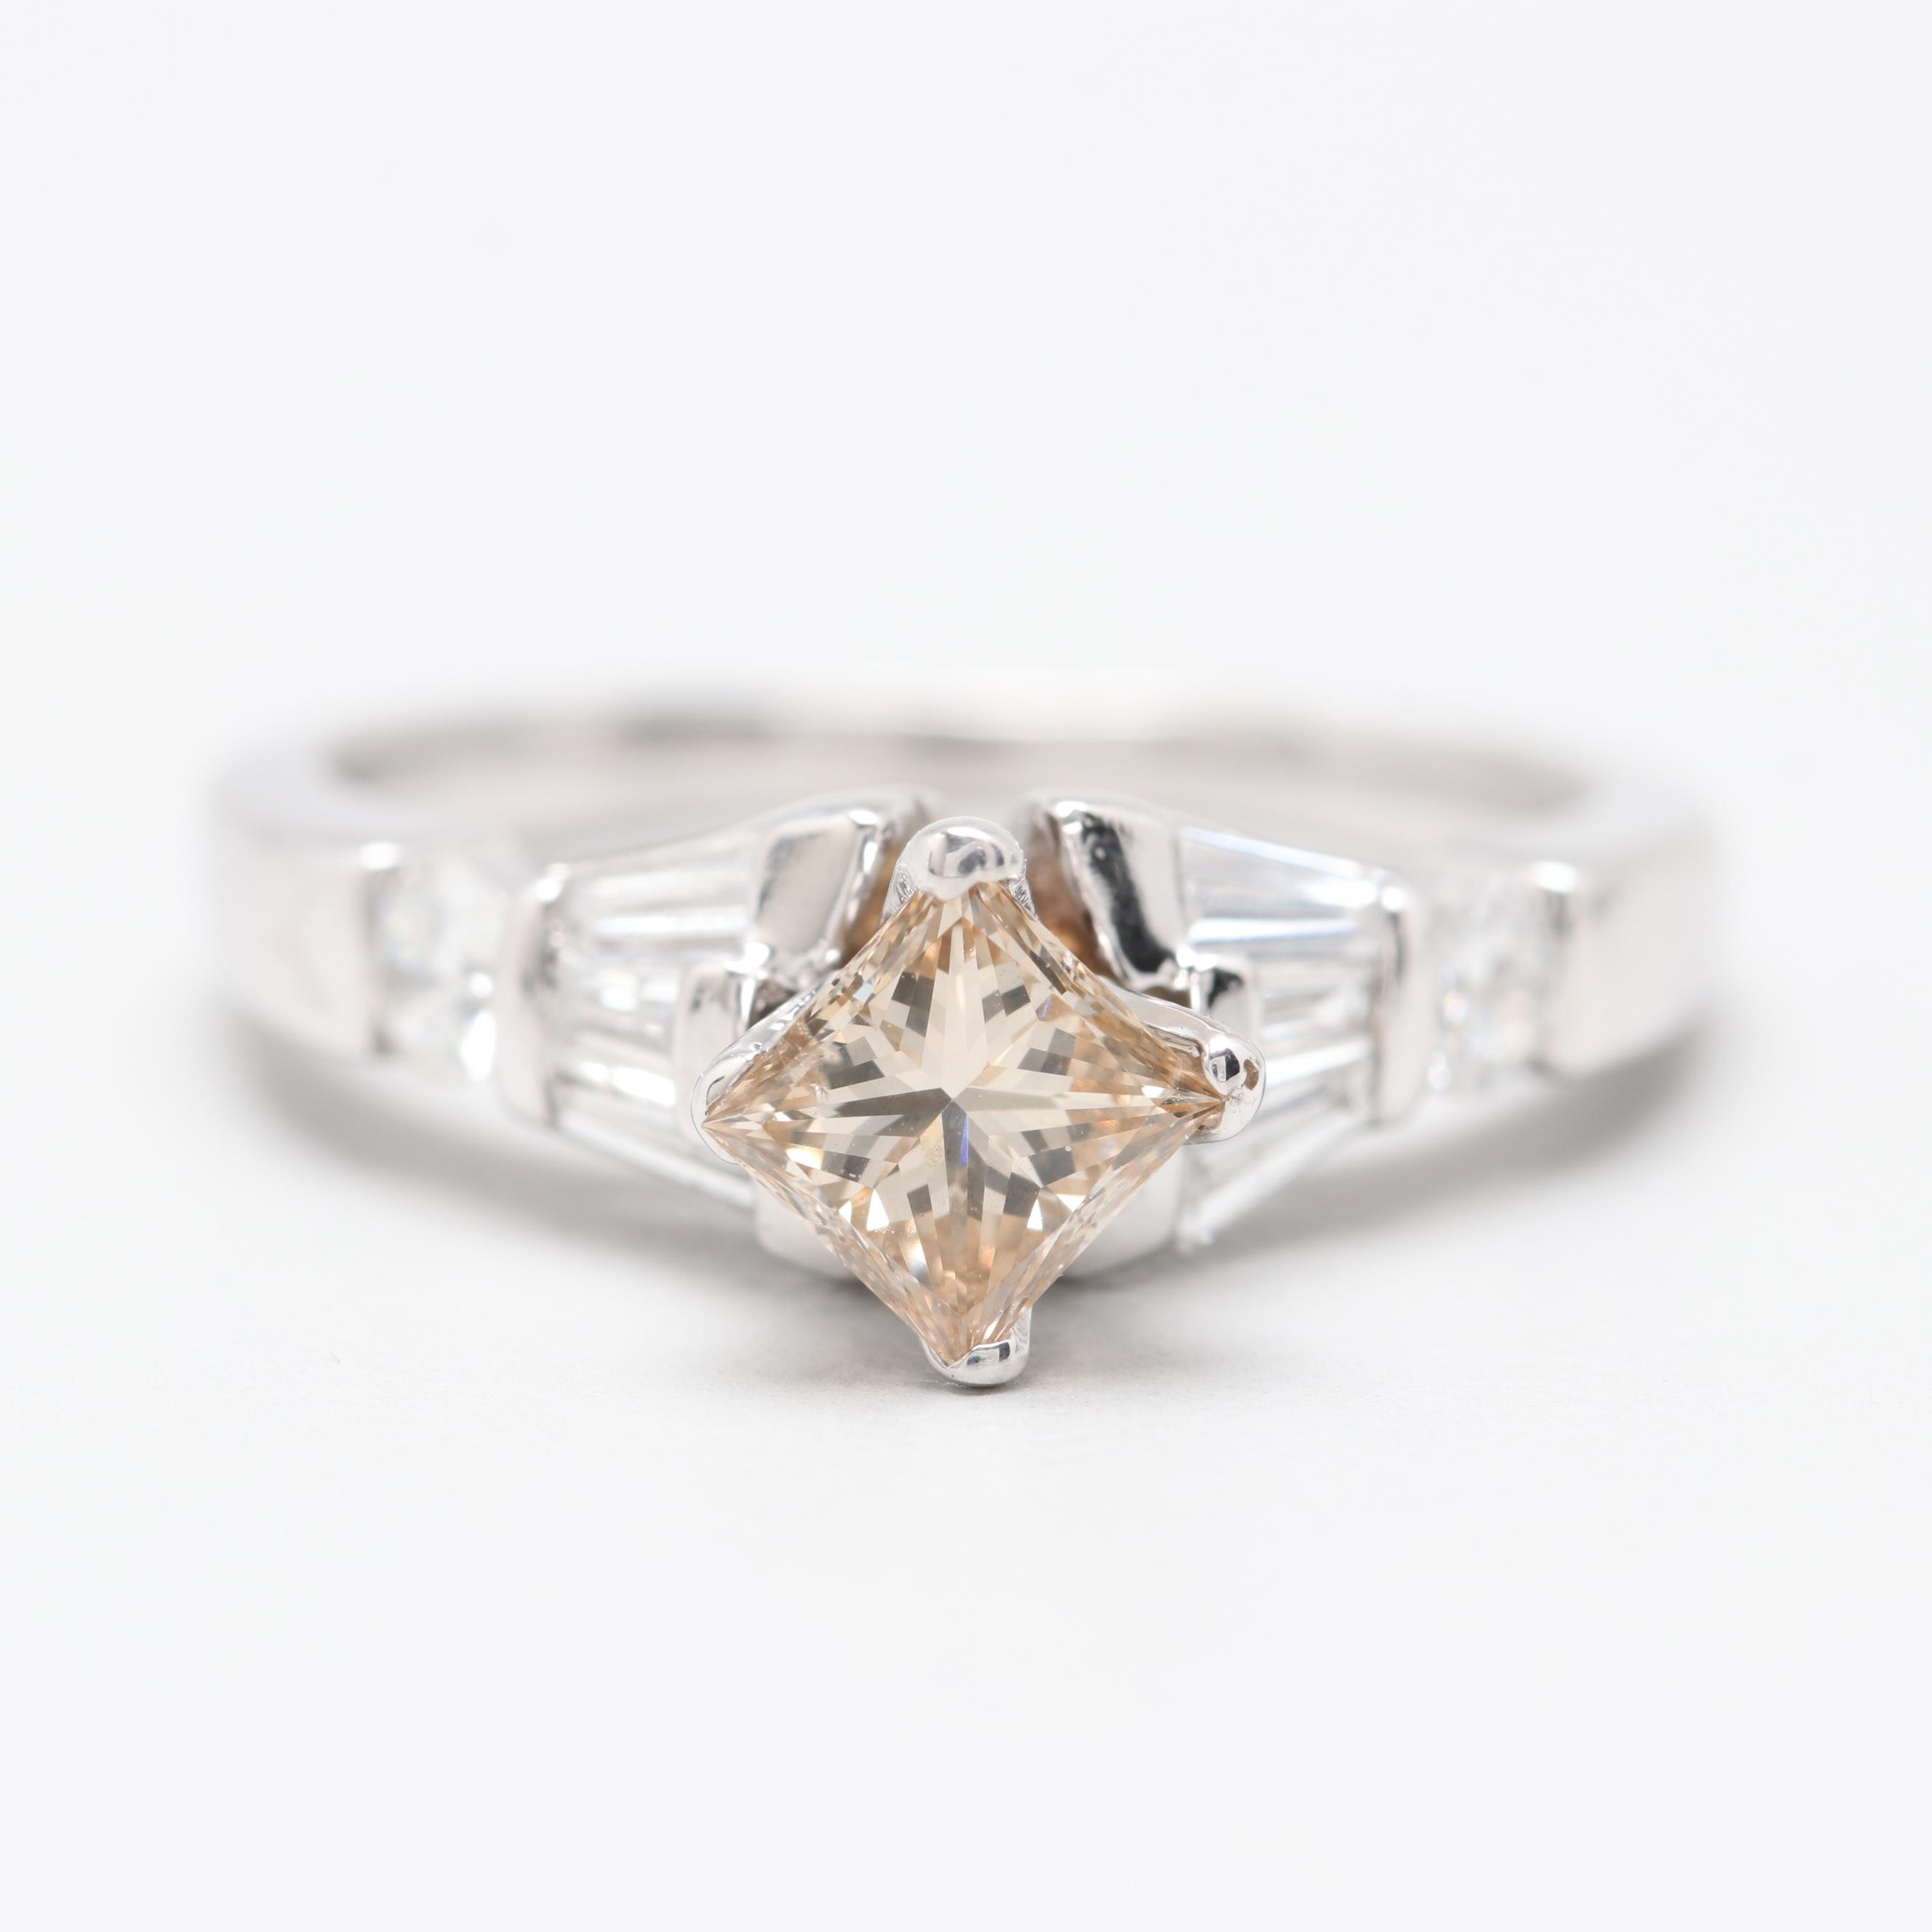 Platinum and 10K White Gold Diamond Ring